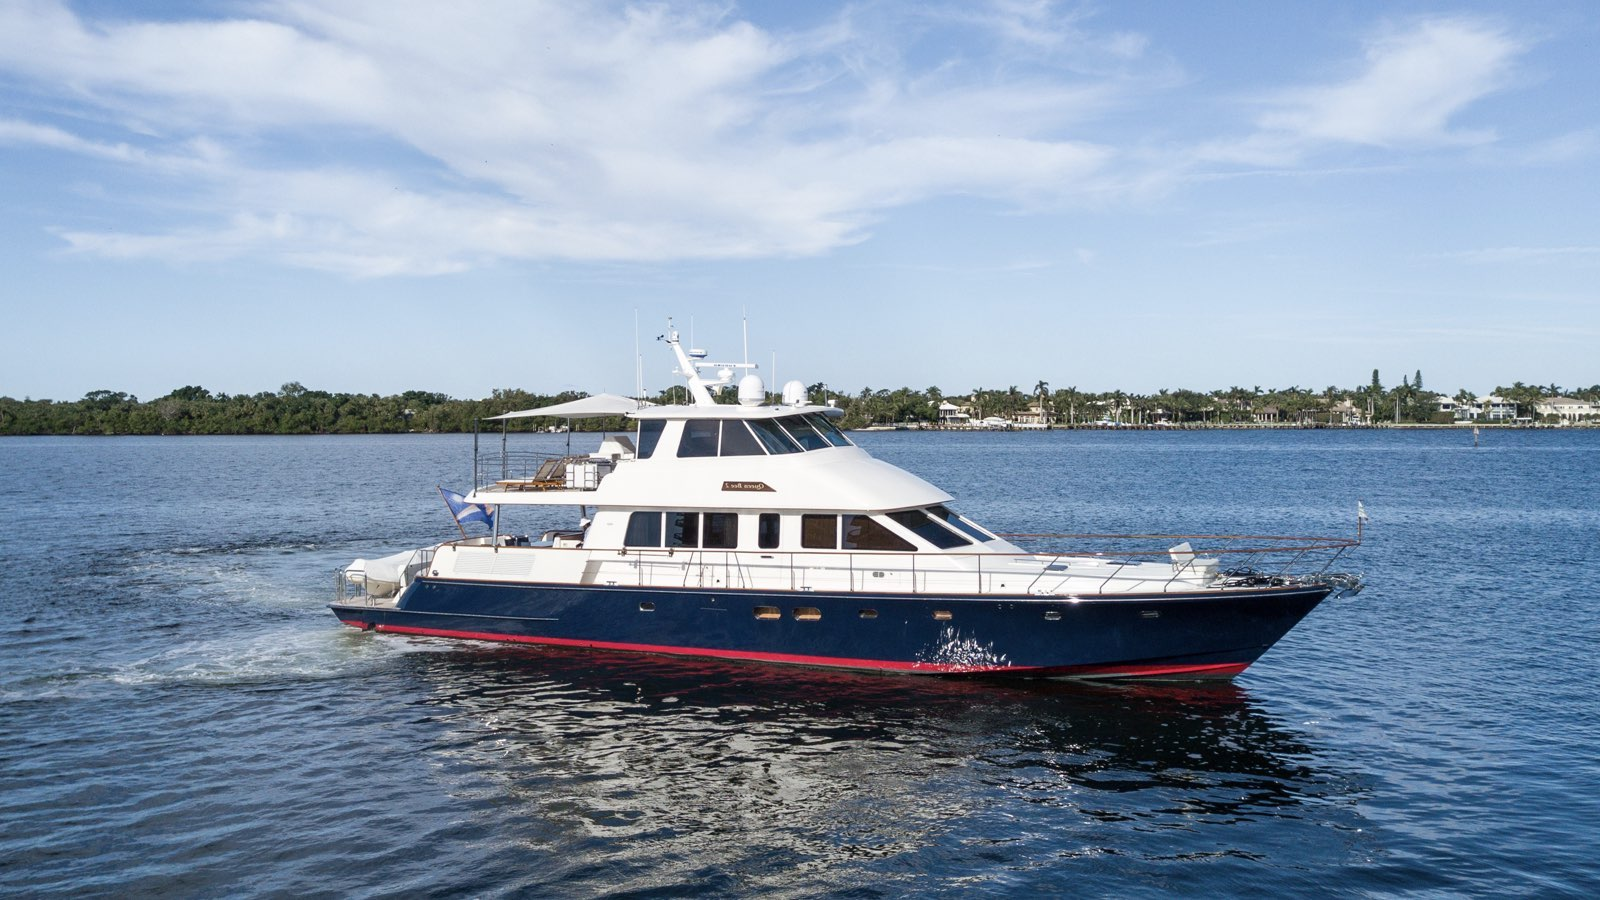 QUEEN BEE 2 Yacht for Sale